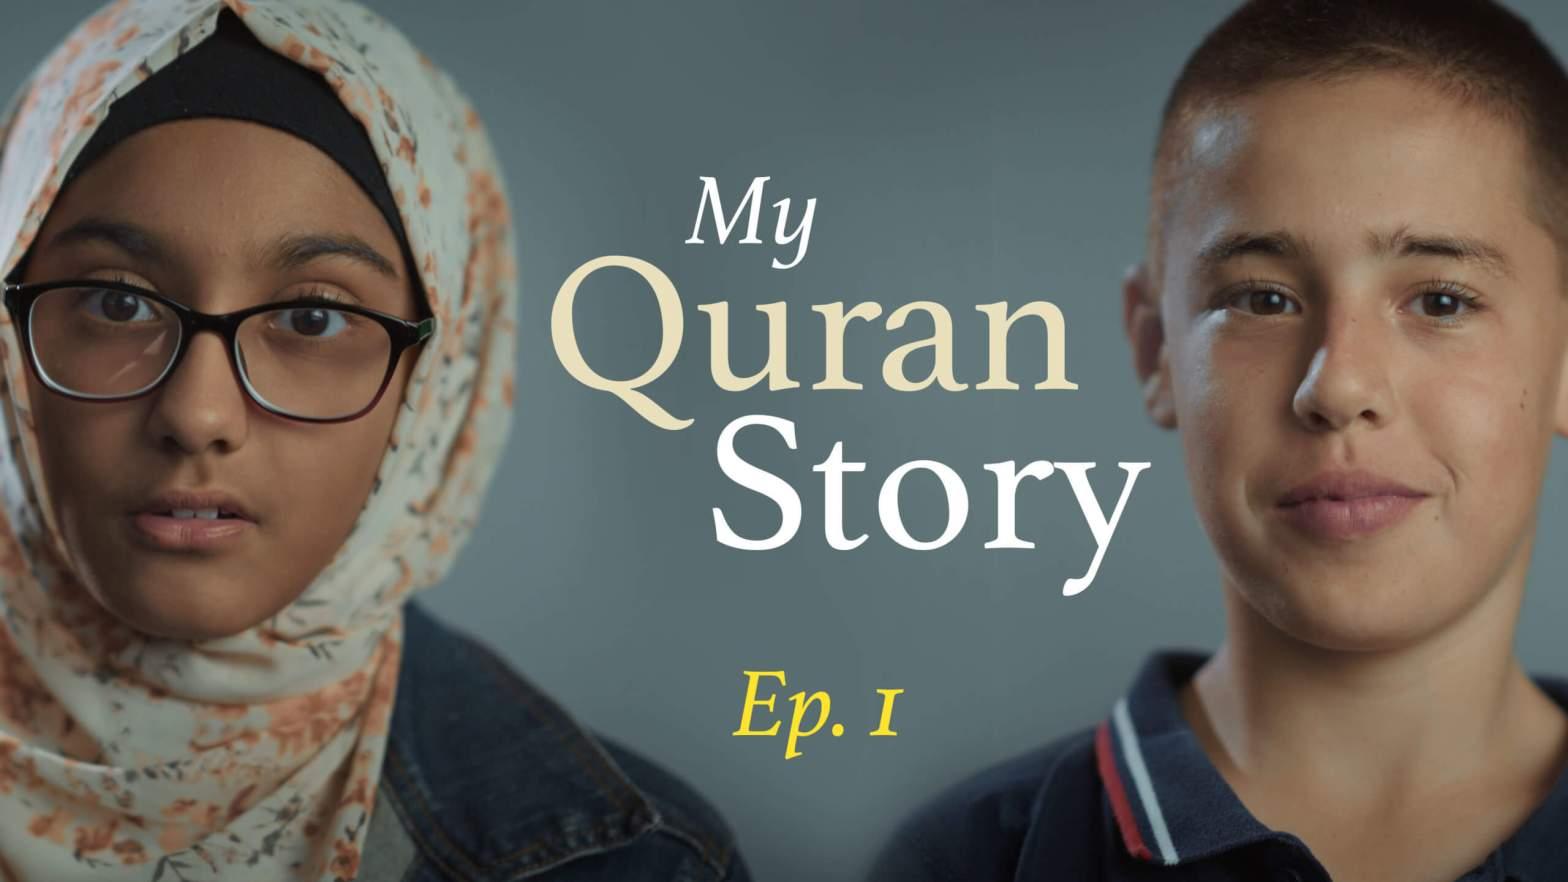 My Quran Story Ep.1 - Defining the Quran